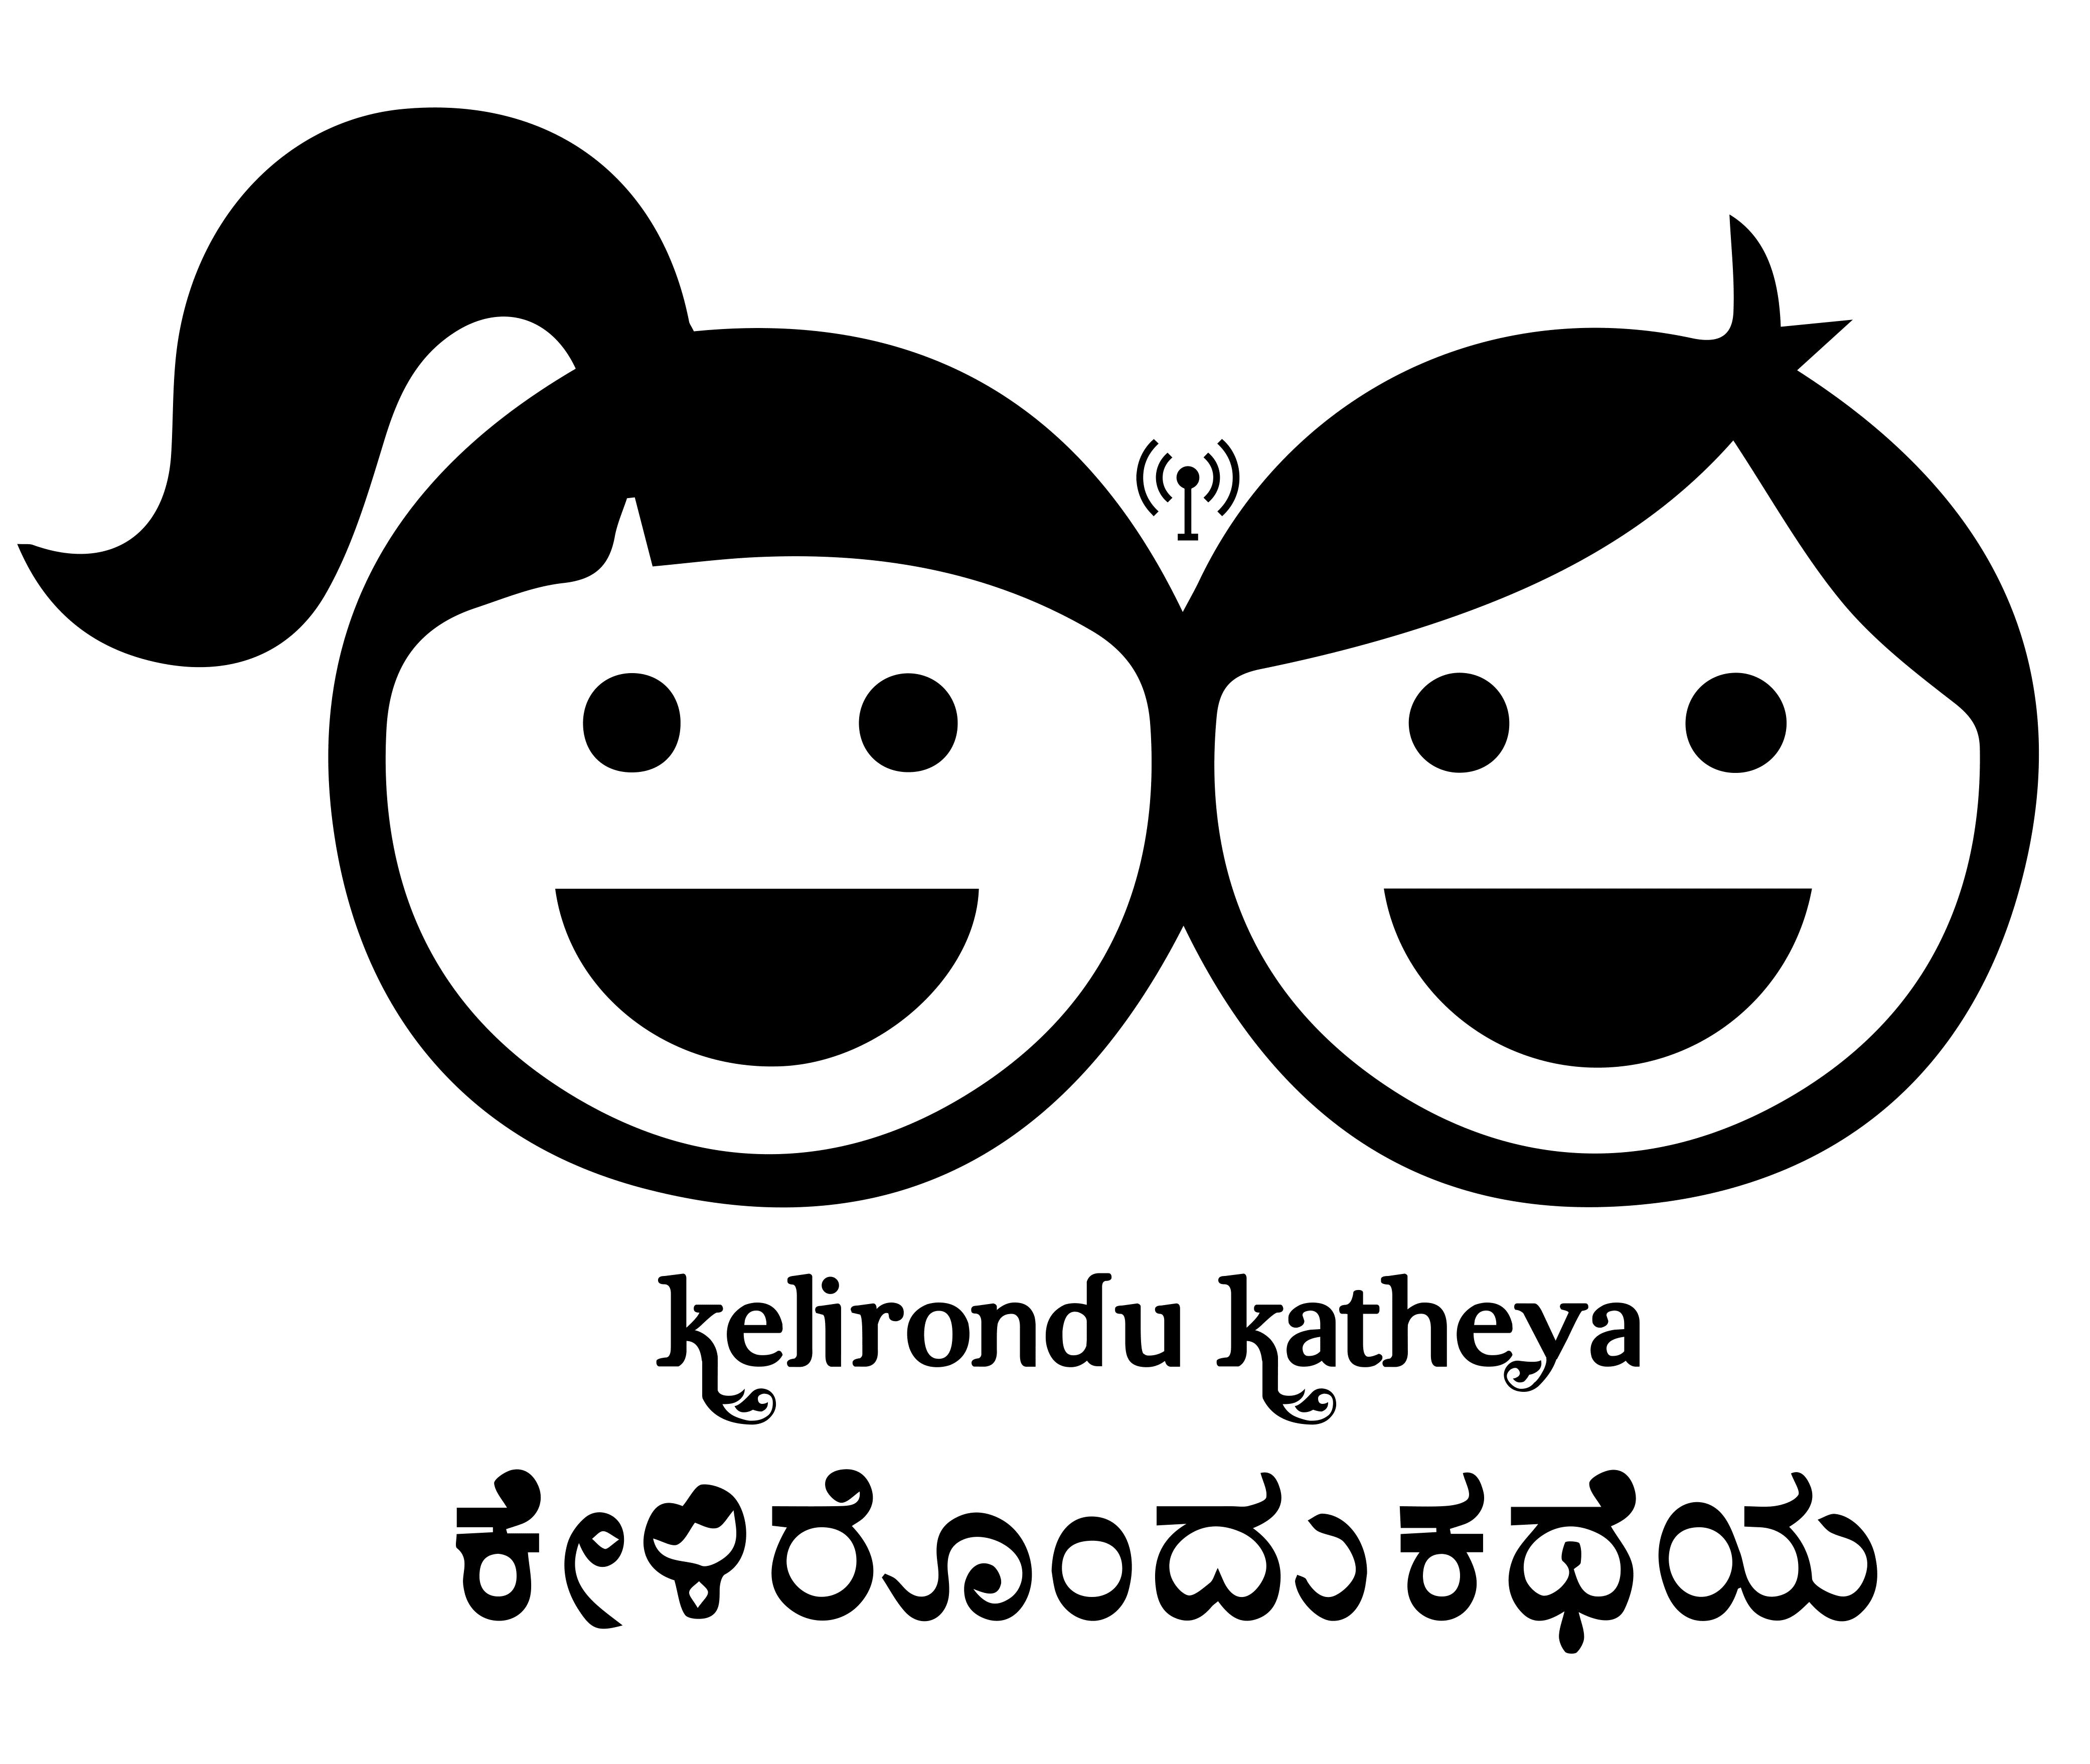 Kelirondu Katheya ಕೇಳಿರೊಂದು ಕಥೆಯ